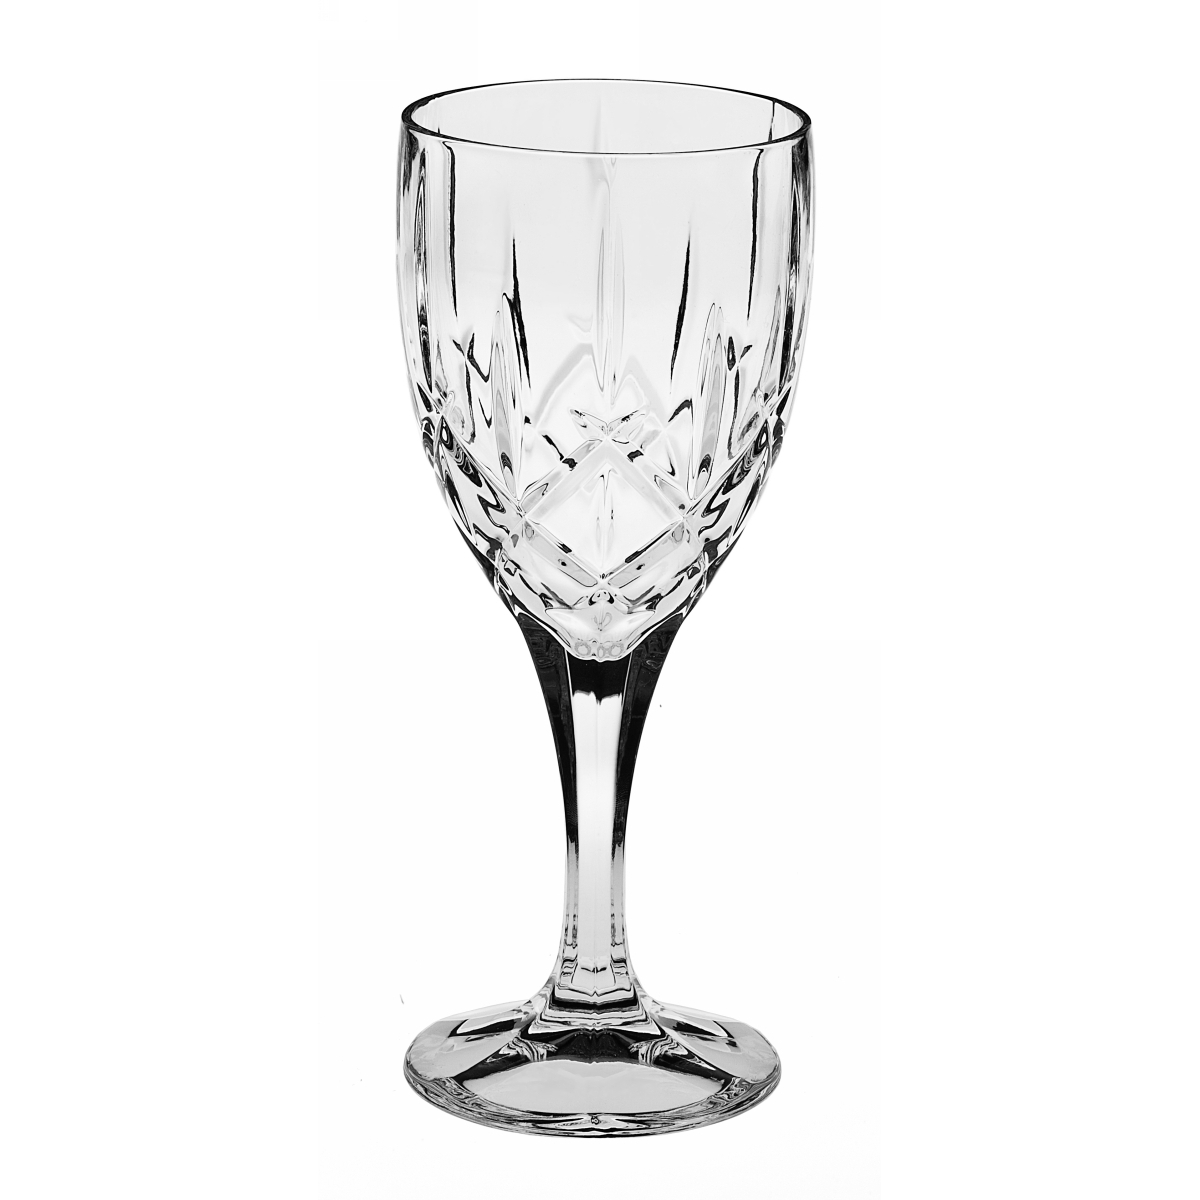 Sheffield Set 6 Pahare Cristal Bohemia Vin 330 Ml 2021 aranjareamesei.ro